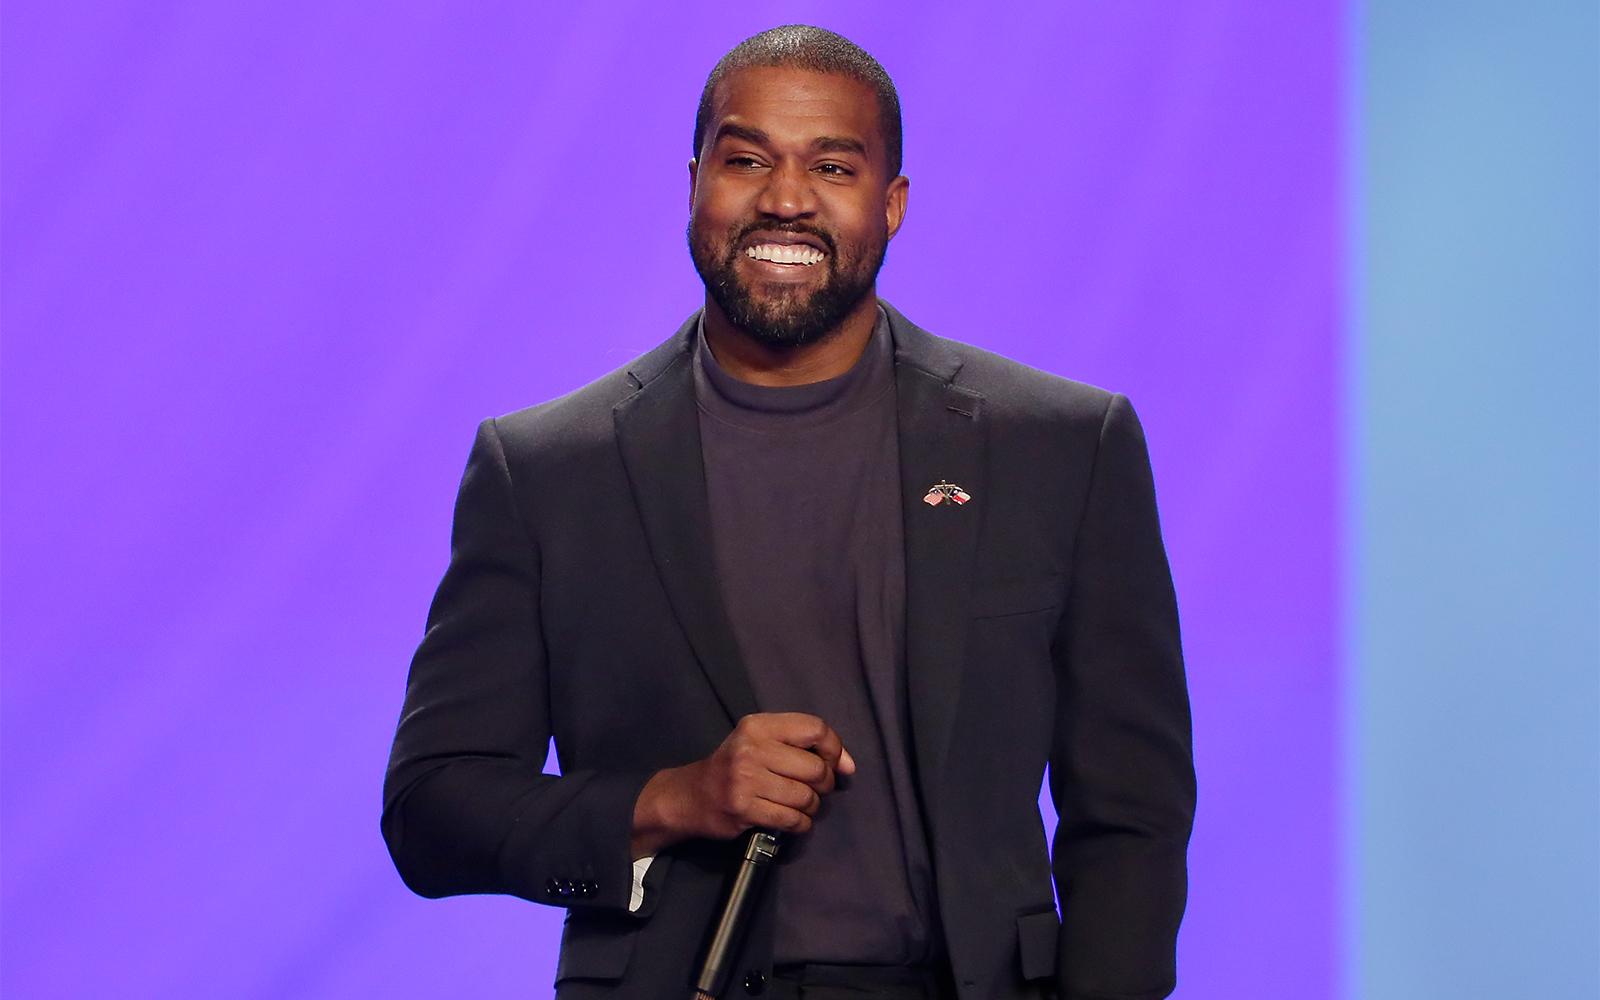 Kayne West Announces His Bid For The Presidency